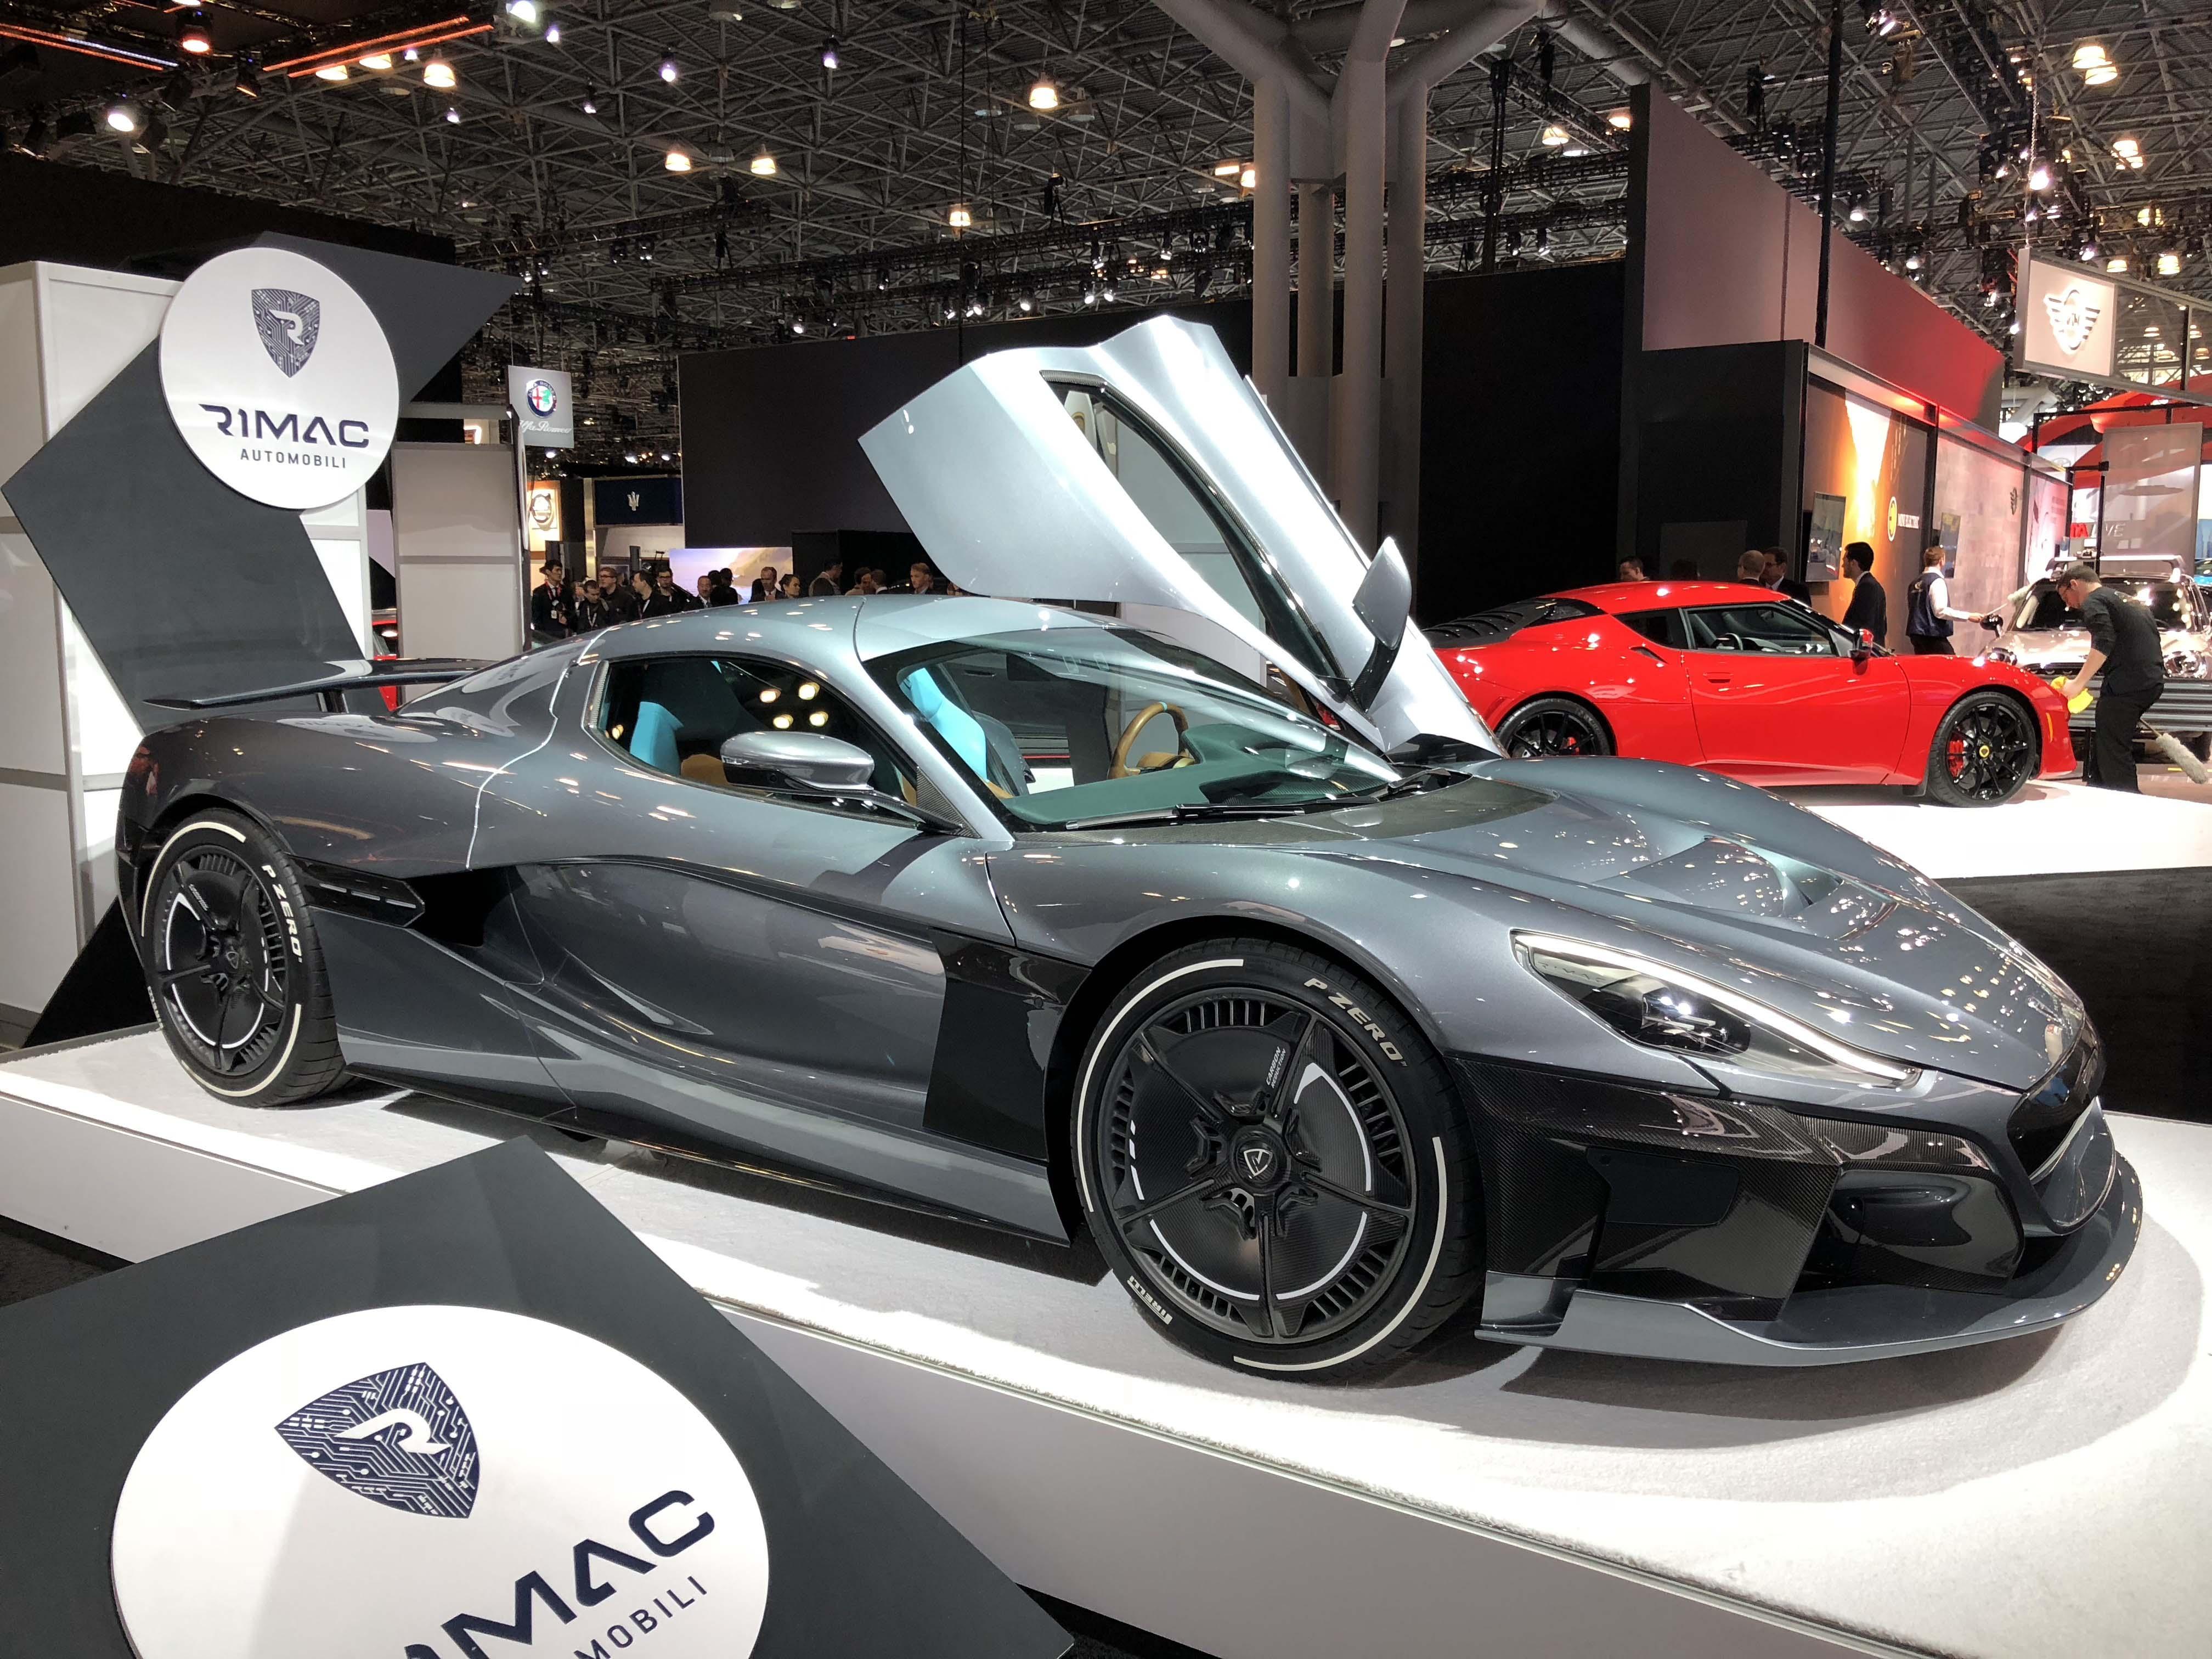 Rimac Automobili Concept 2 All Electric Super Performance